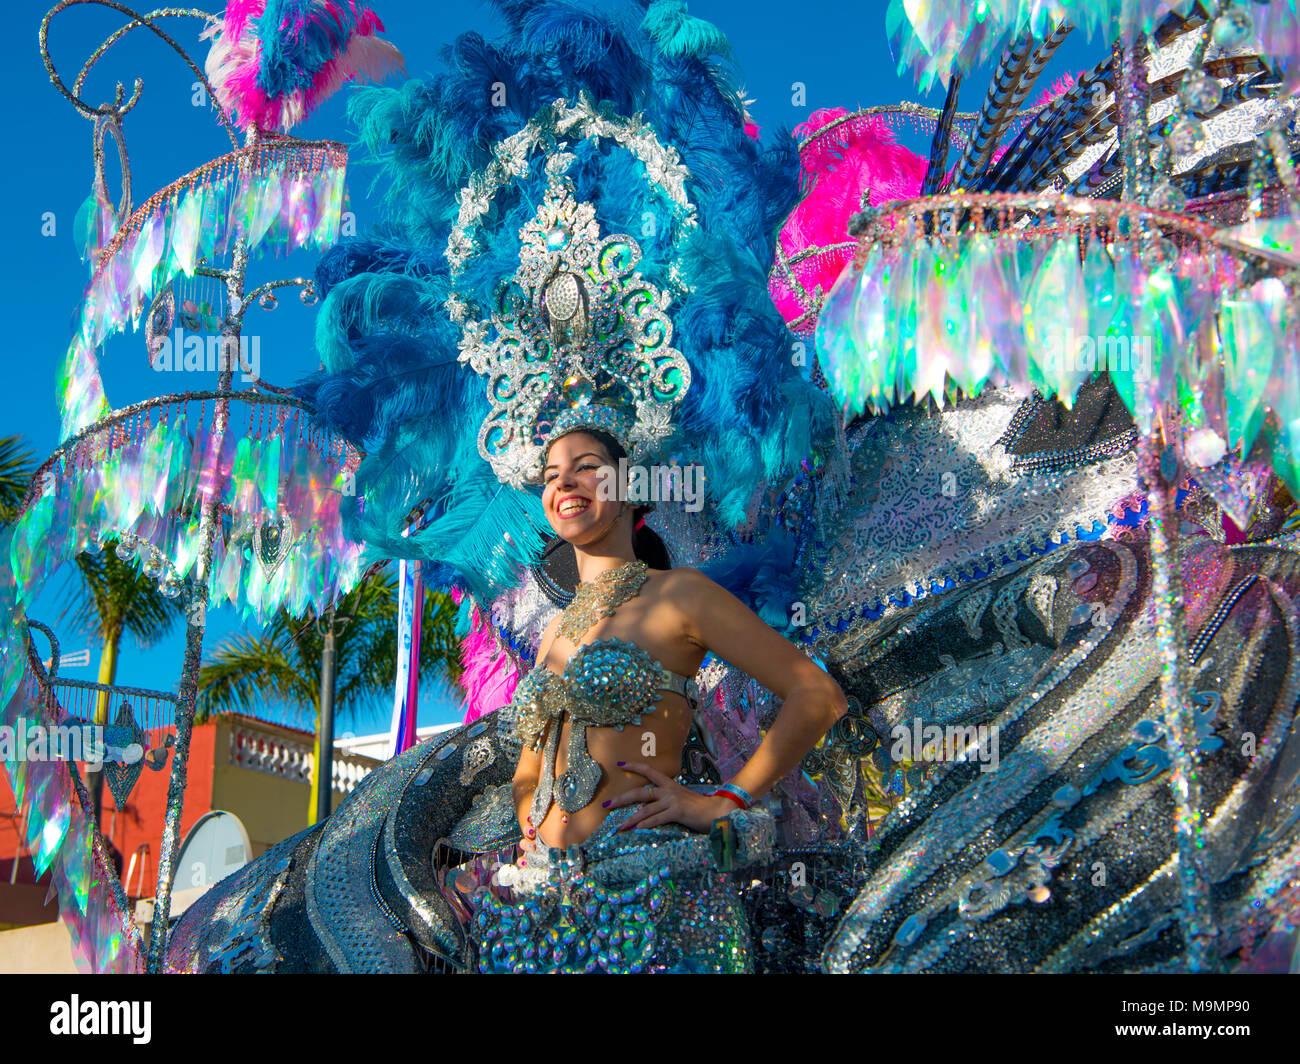 Woman in fanciful costume on carriage, carnival, street carnival, Puerto de la Cruz, Tenerife, Canary Islands, Spain - Stock Image